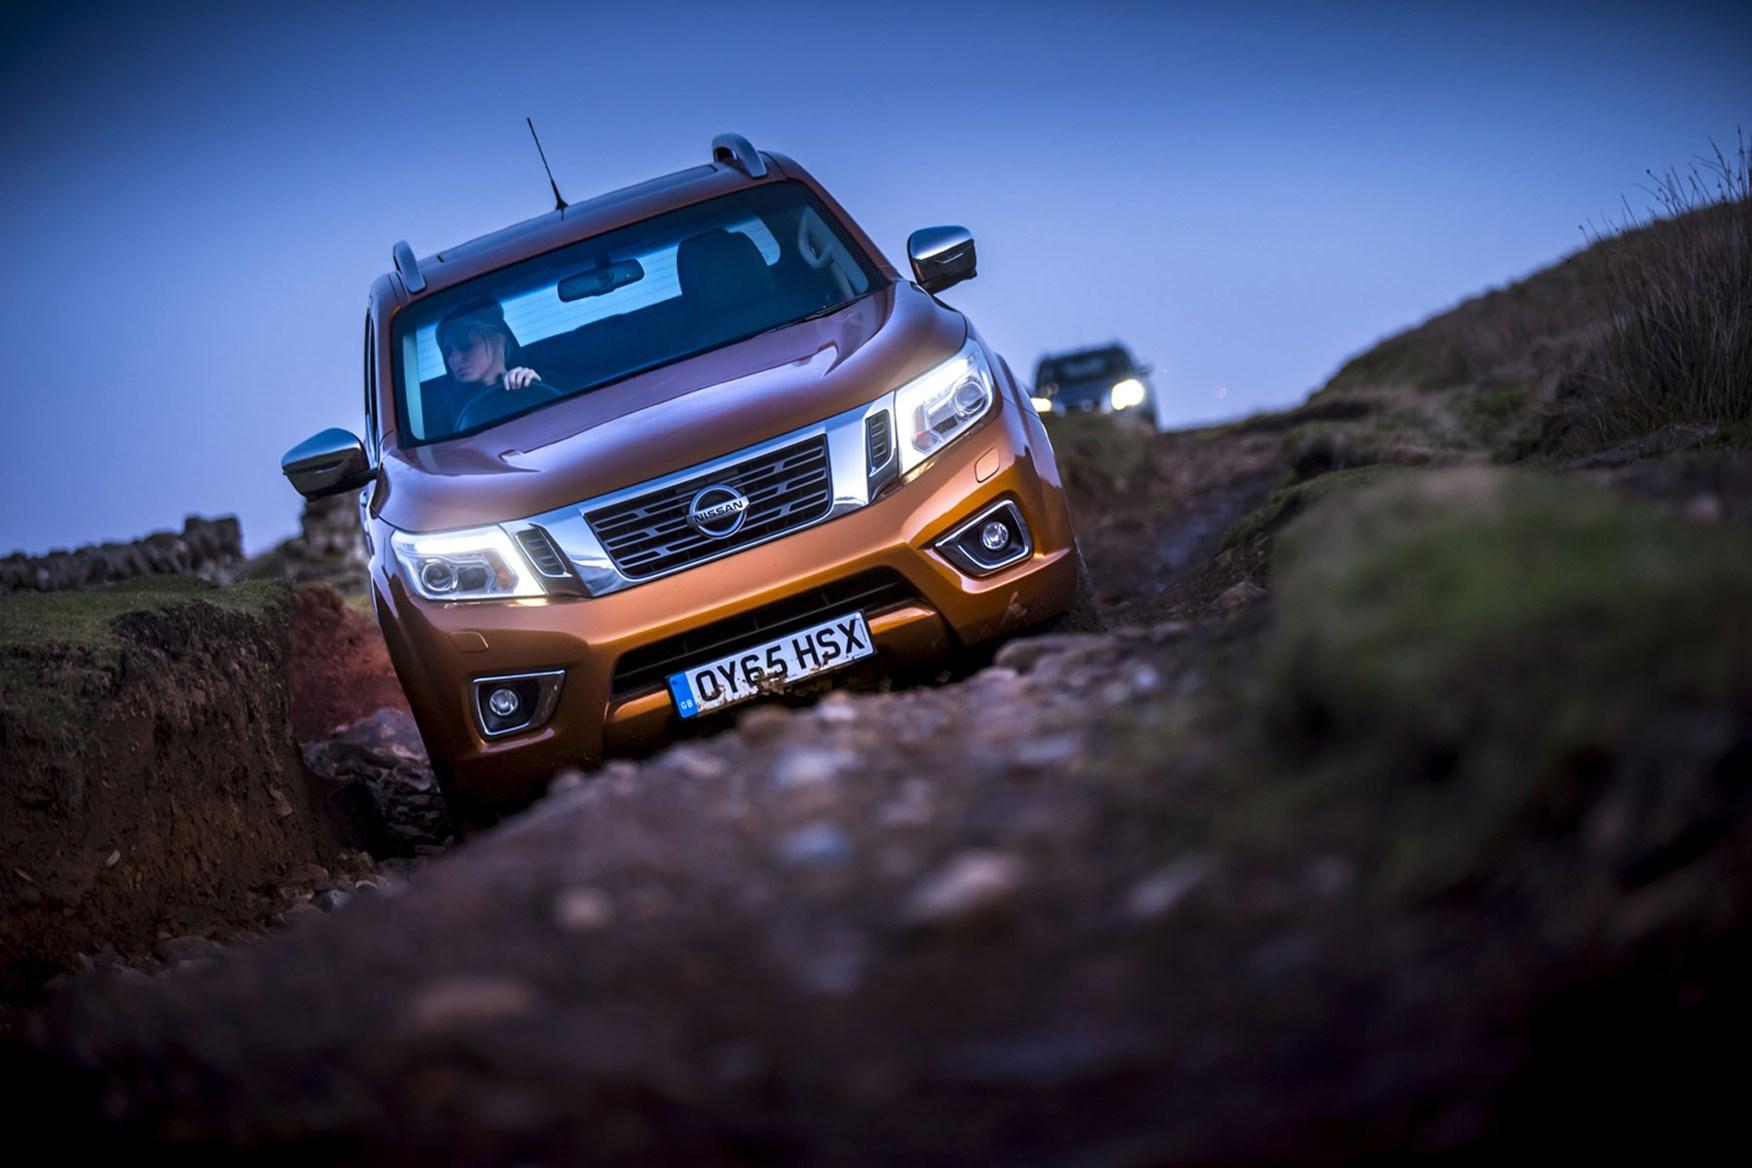 Nissan Navara review - front view, orange, driving off-road